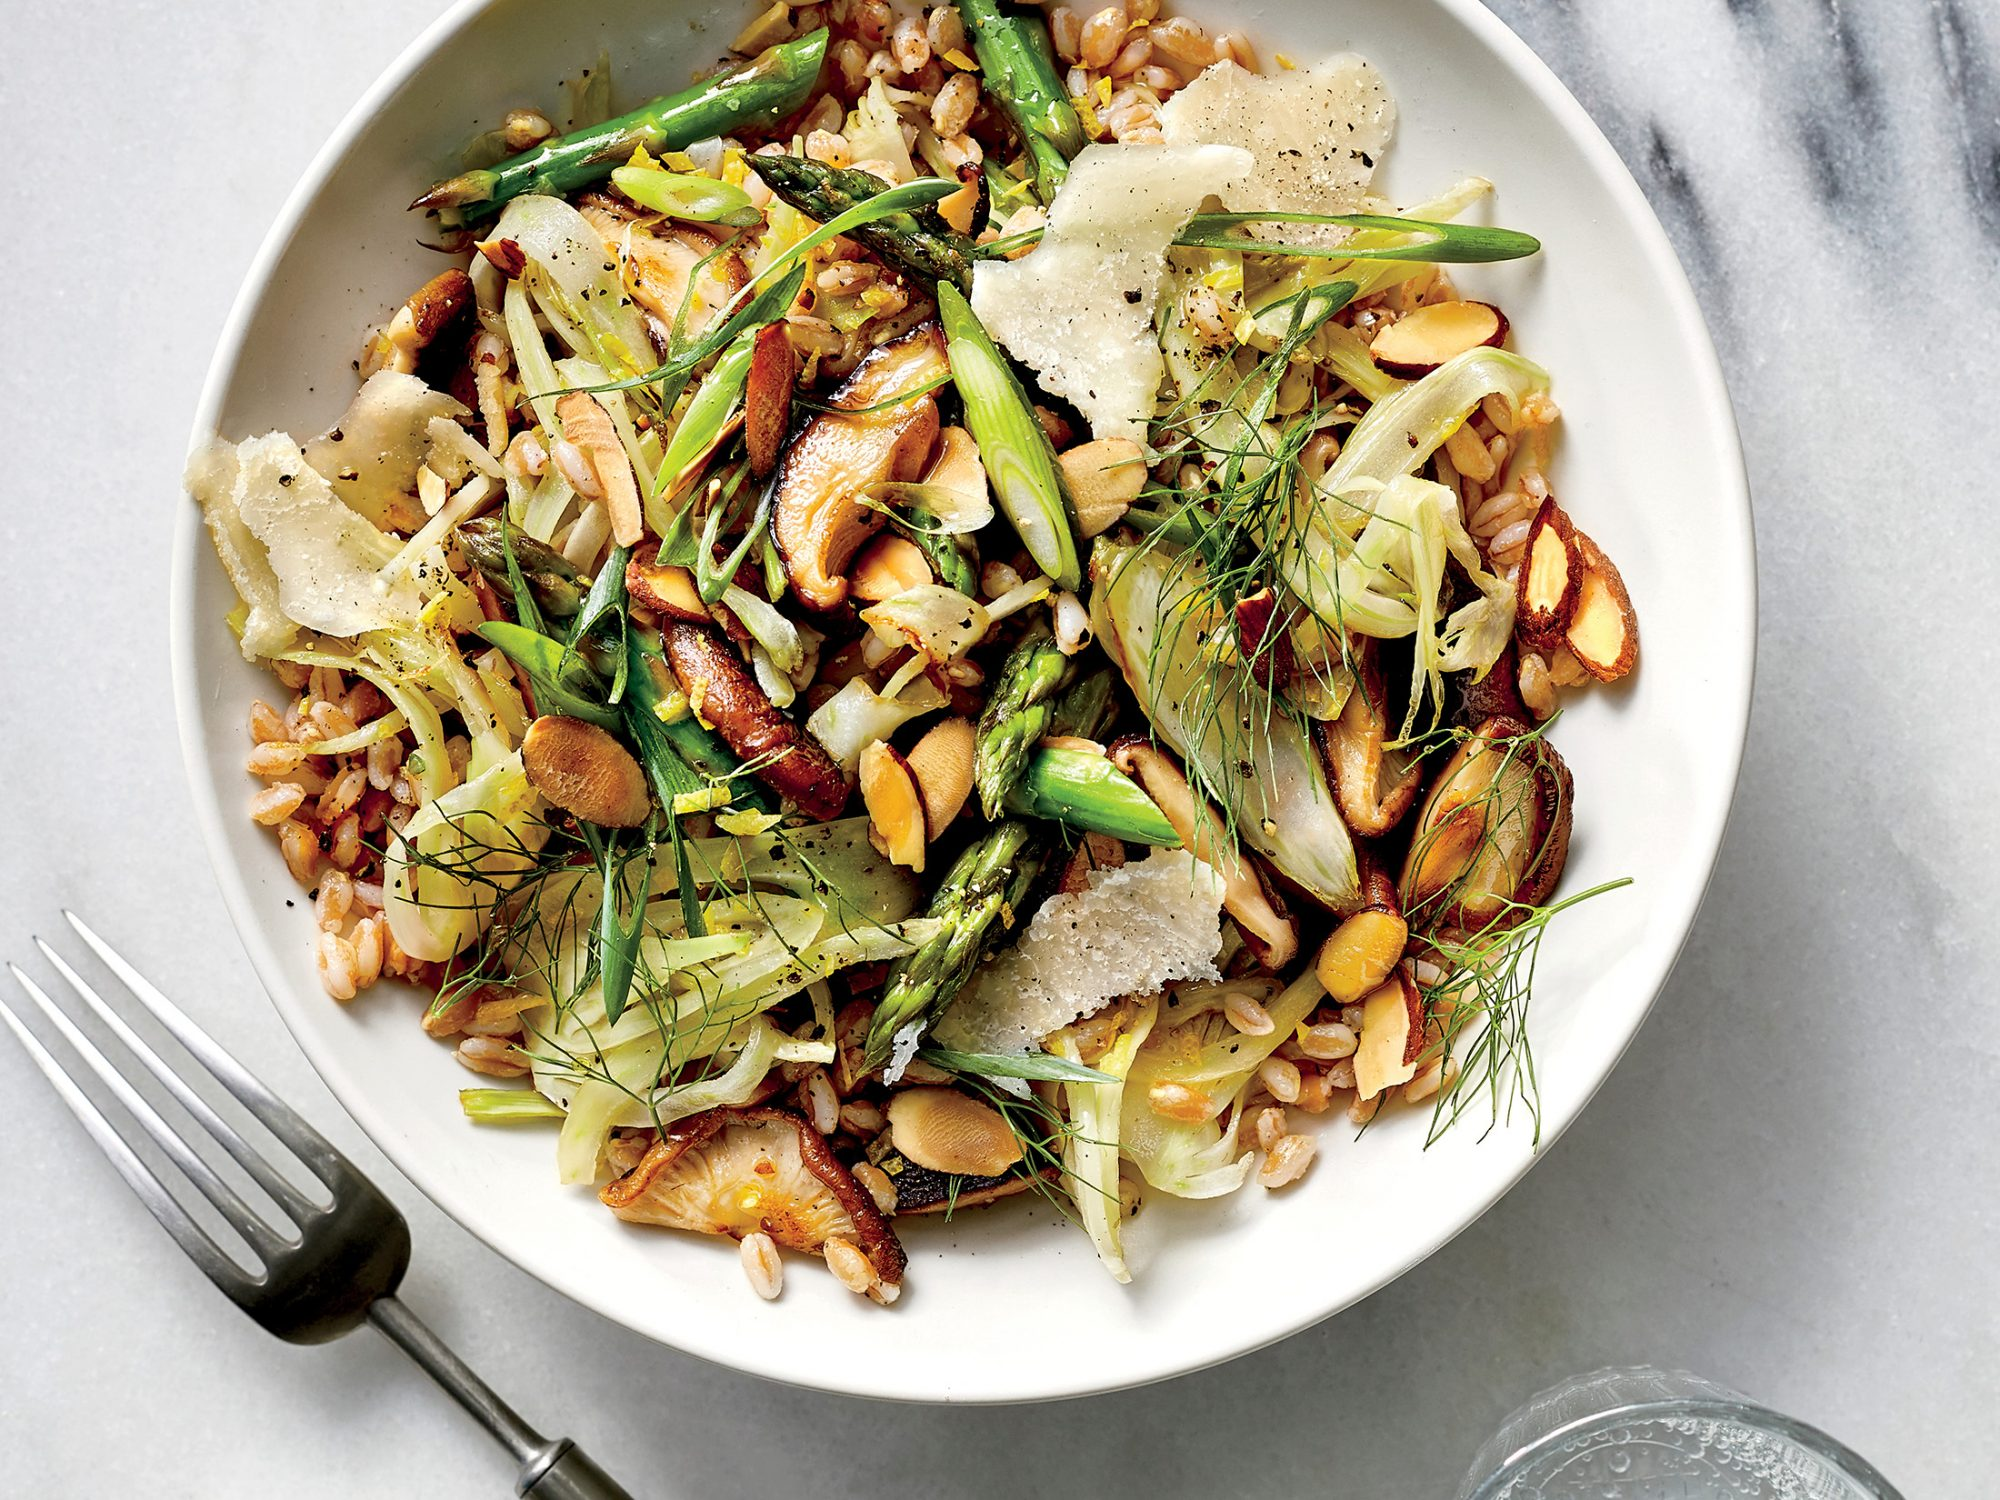 Mushroom and Asparagus Grain Bowl